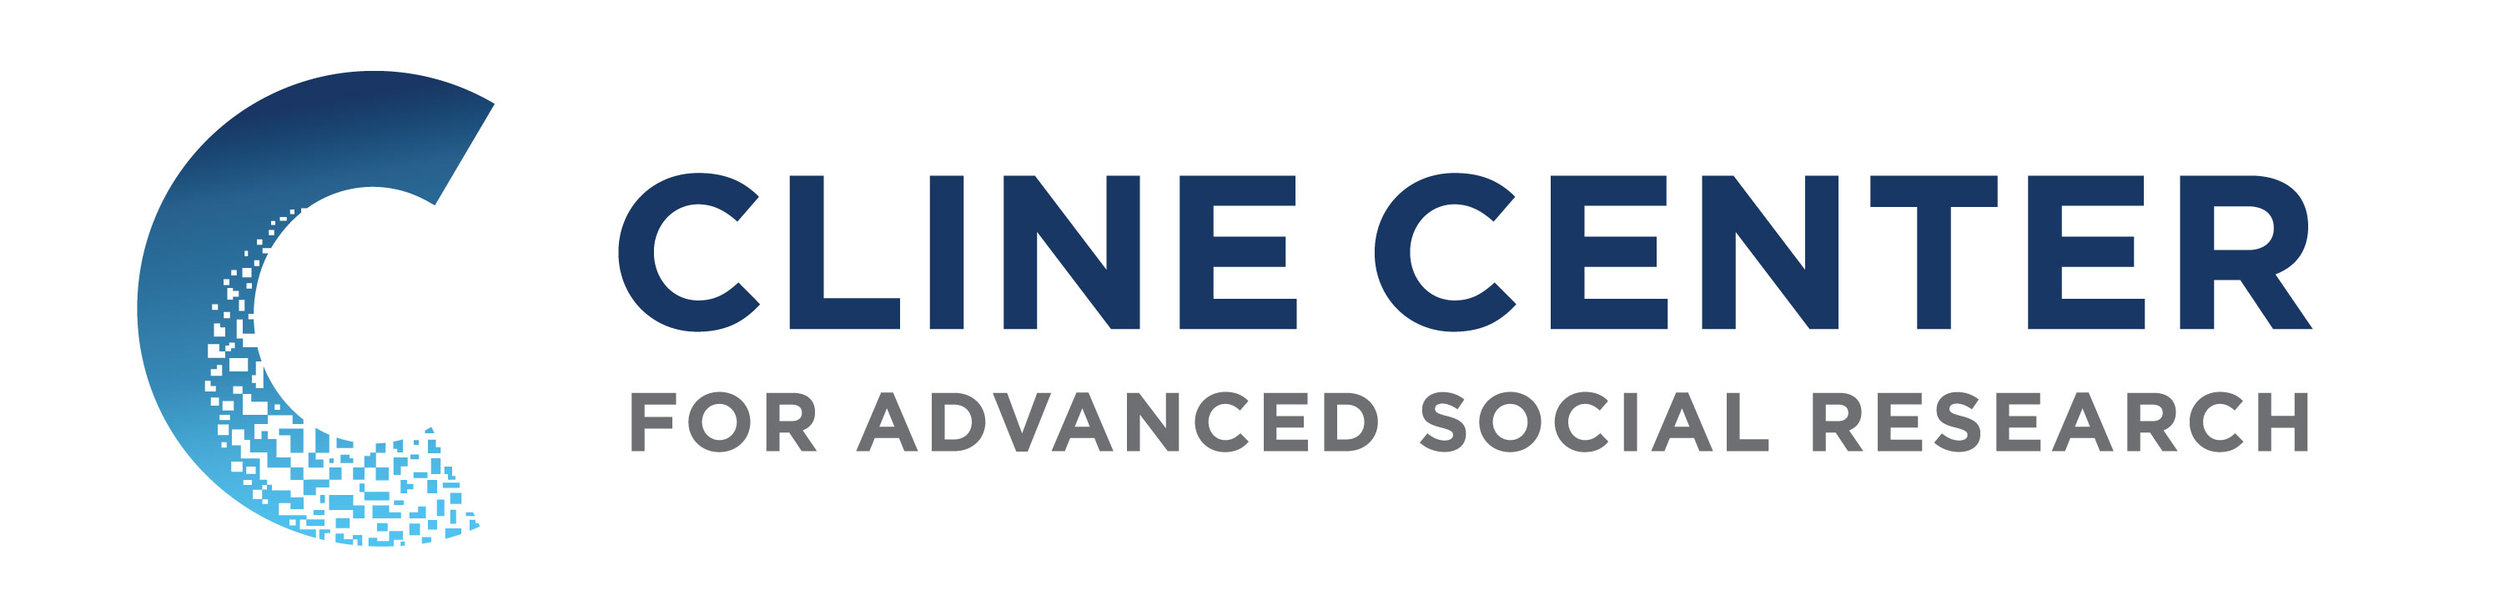 Cline Center for Advanced Social Research.jpg